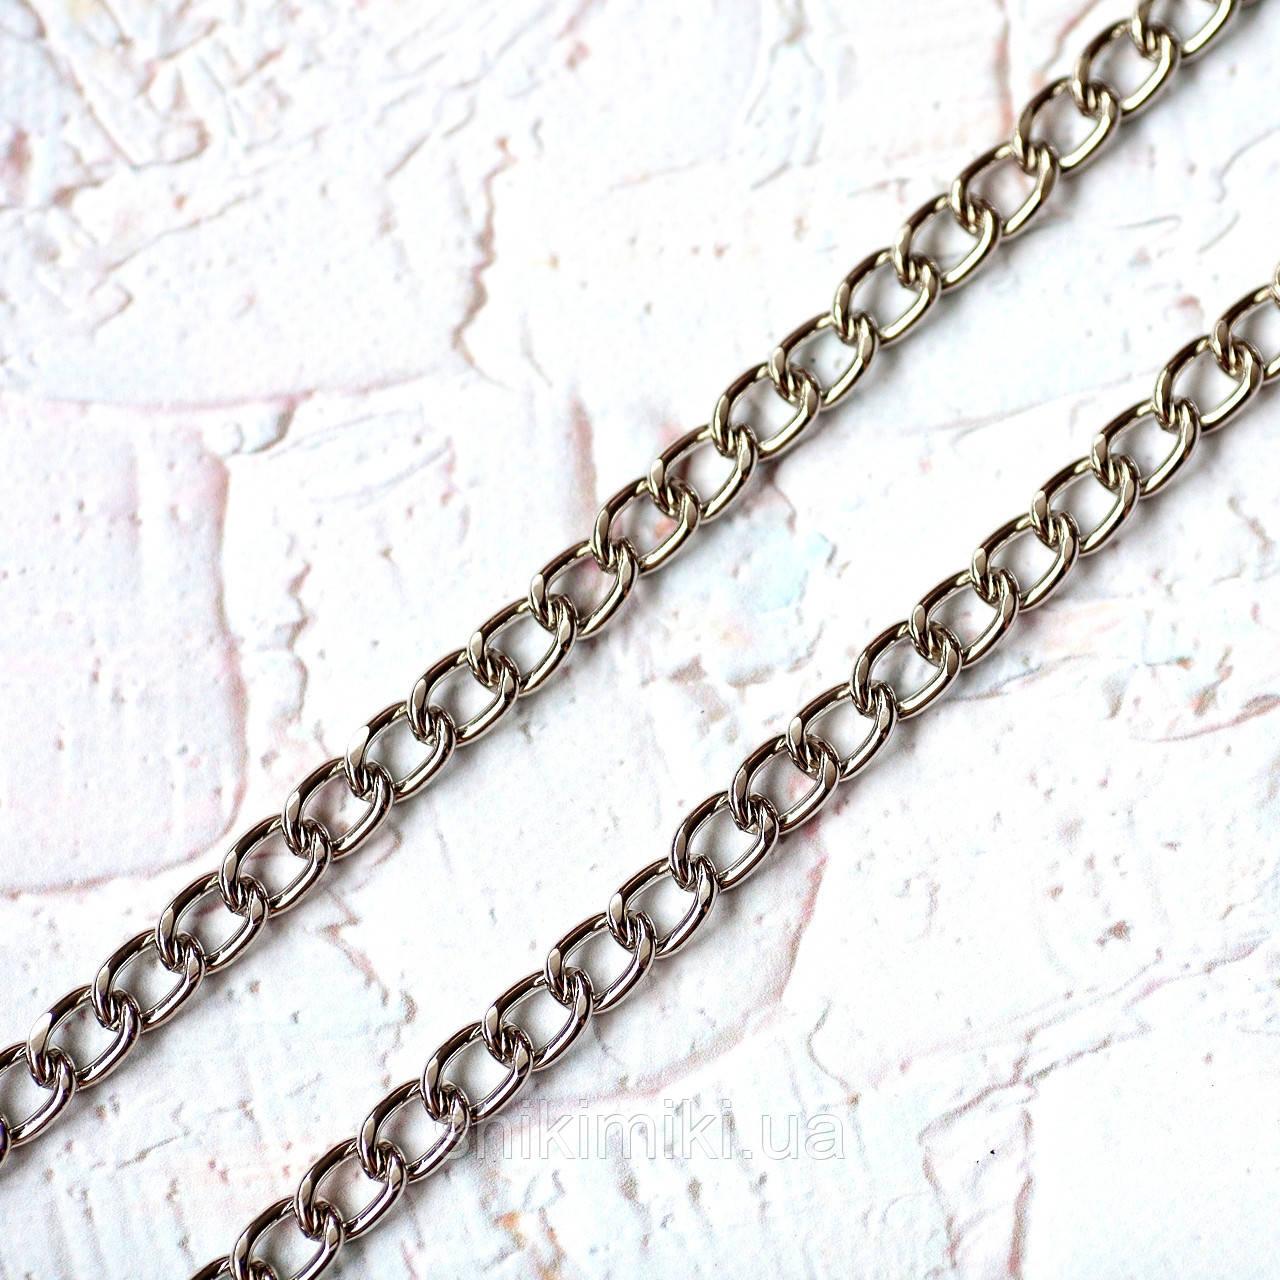 Цепочка для сумки крупная Z21-1, цвет никель